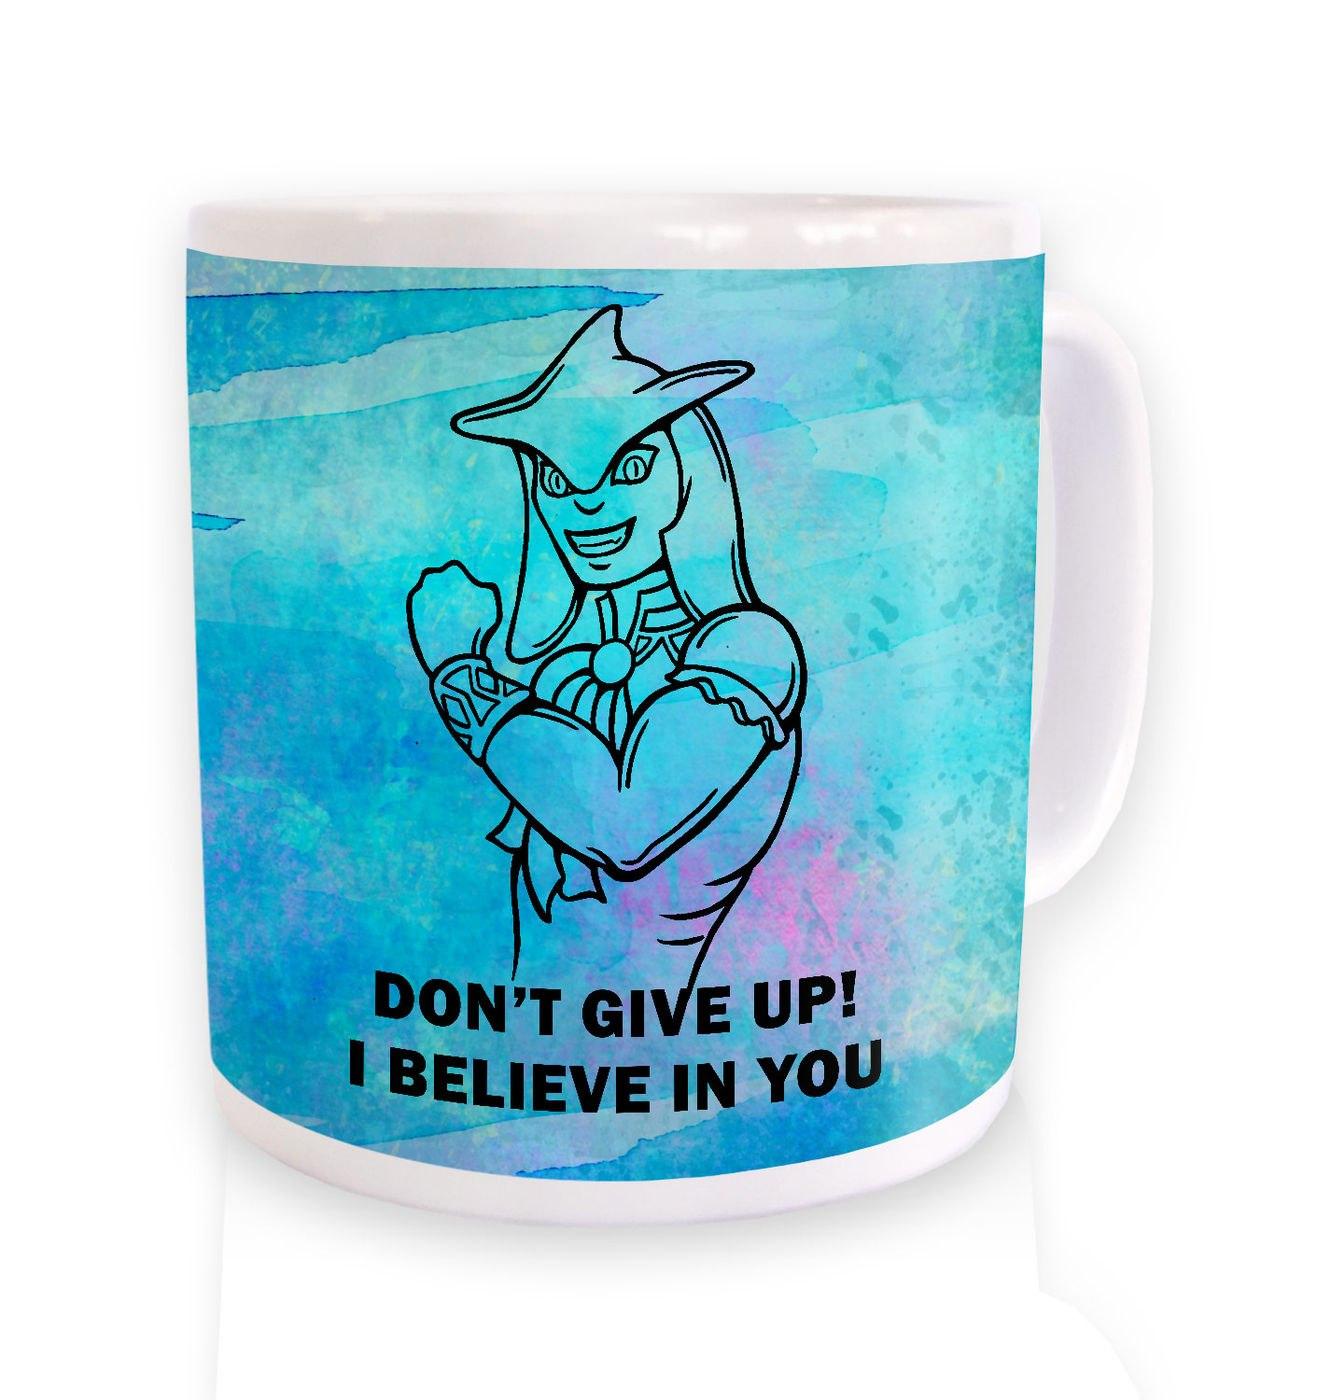 Shark Prince mug by Something Geeky